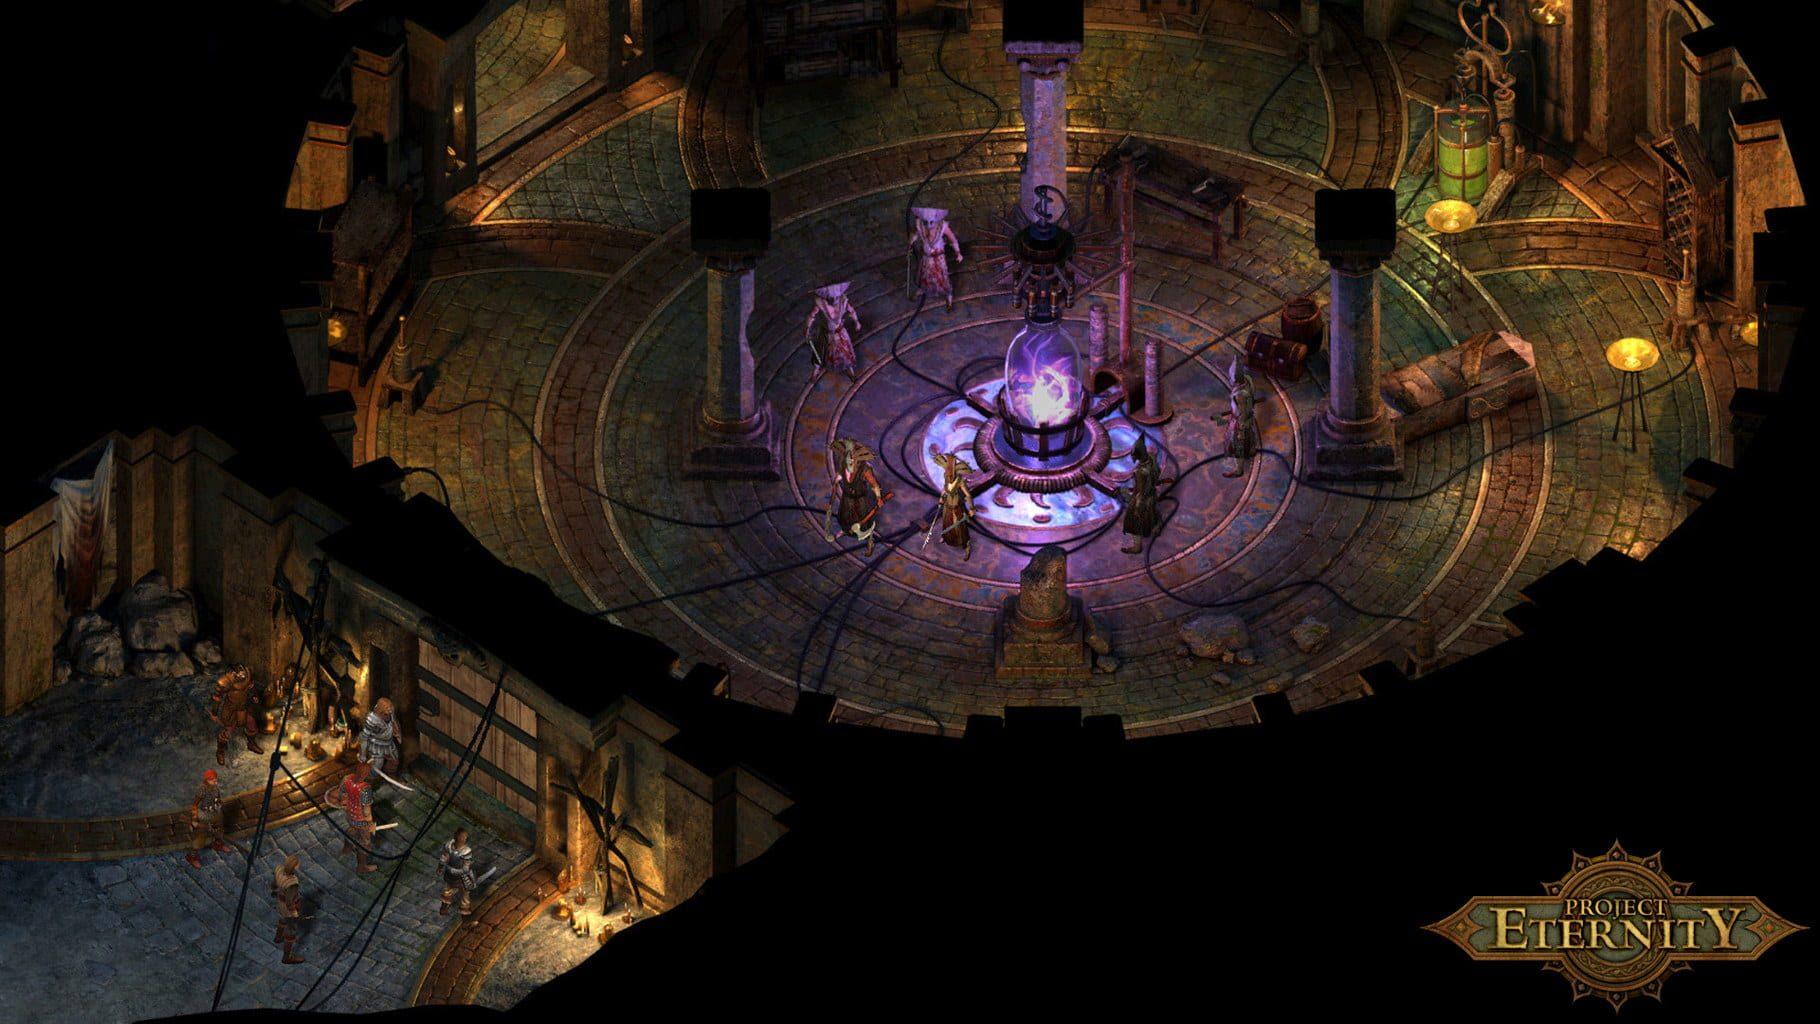 Pillars of Eternity - Recensione | Splendido CRPG moderno, in mobilità